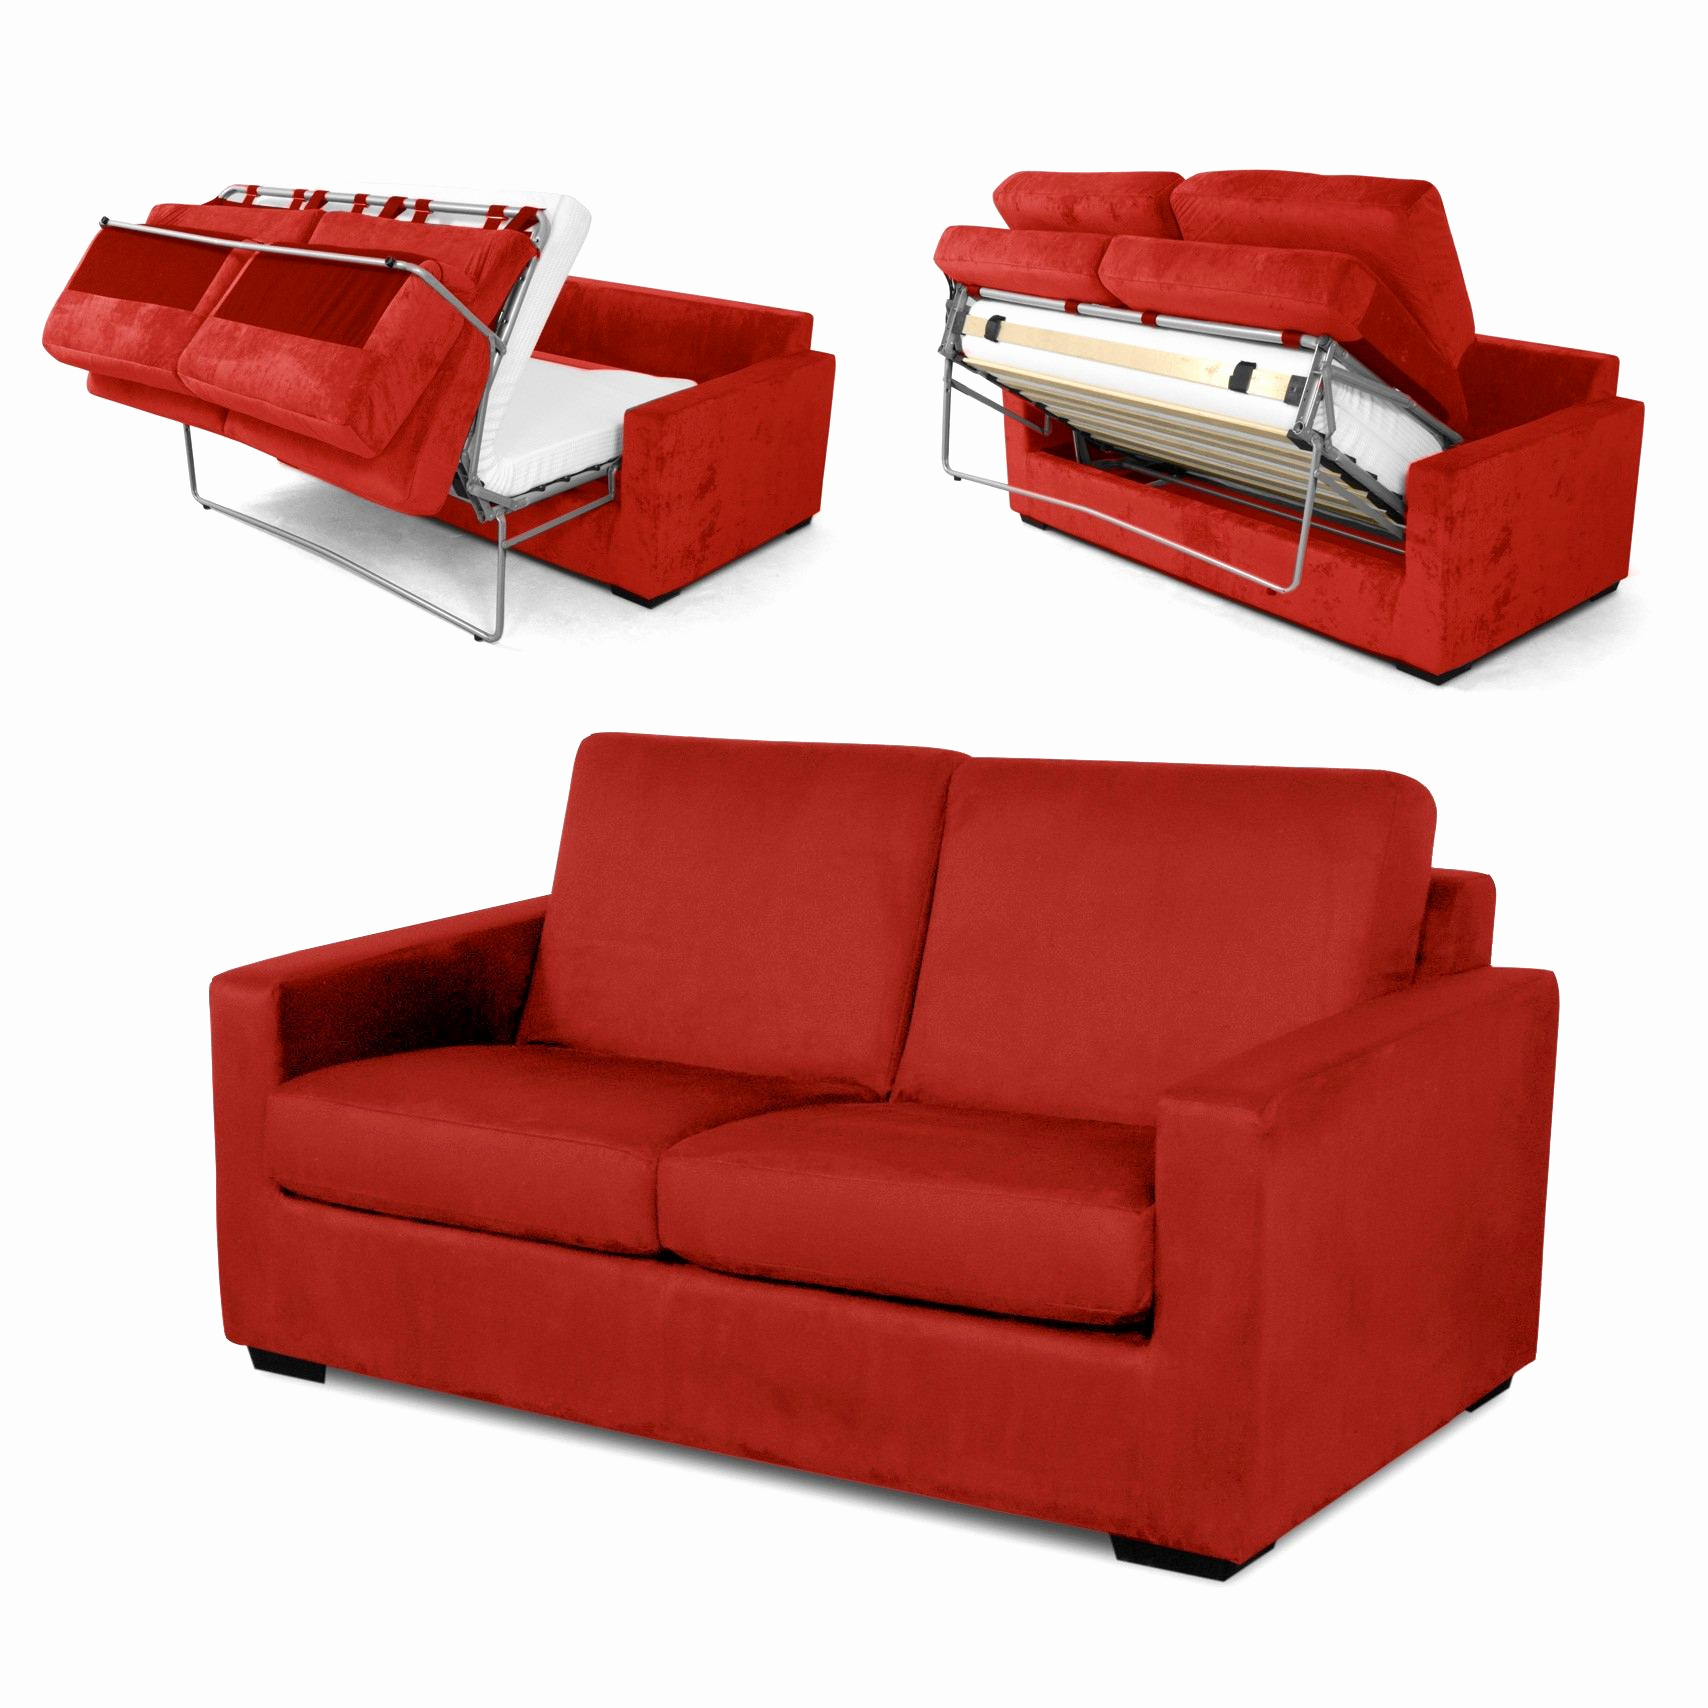 Ikea Housse Clic Clac Luxe Galerie Housse Pour Clic Clac Unique Housse De Clic Clac Ikea Unique O D